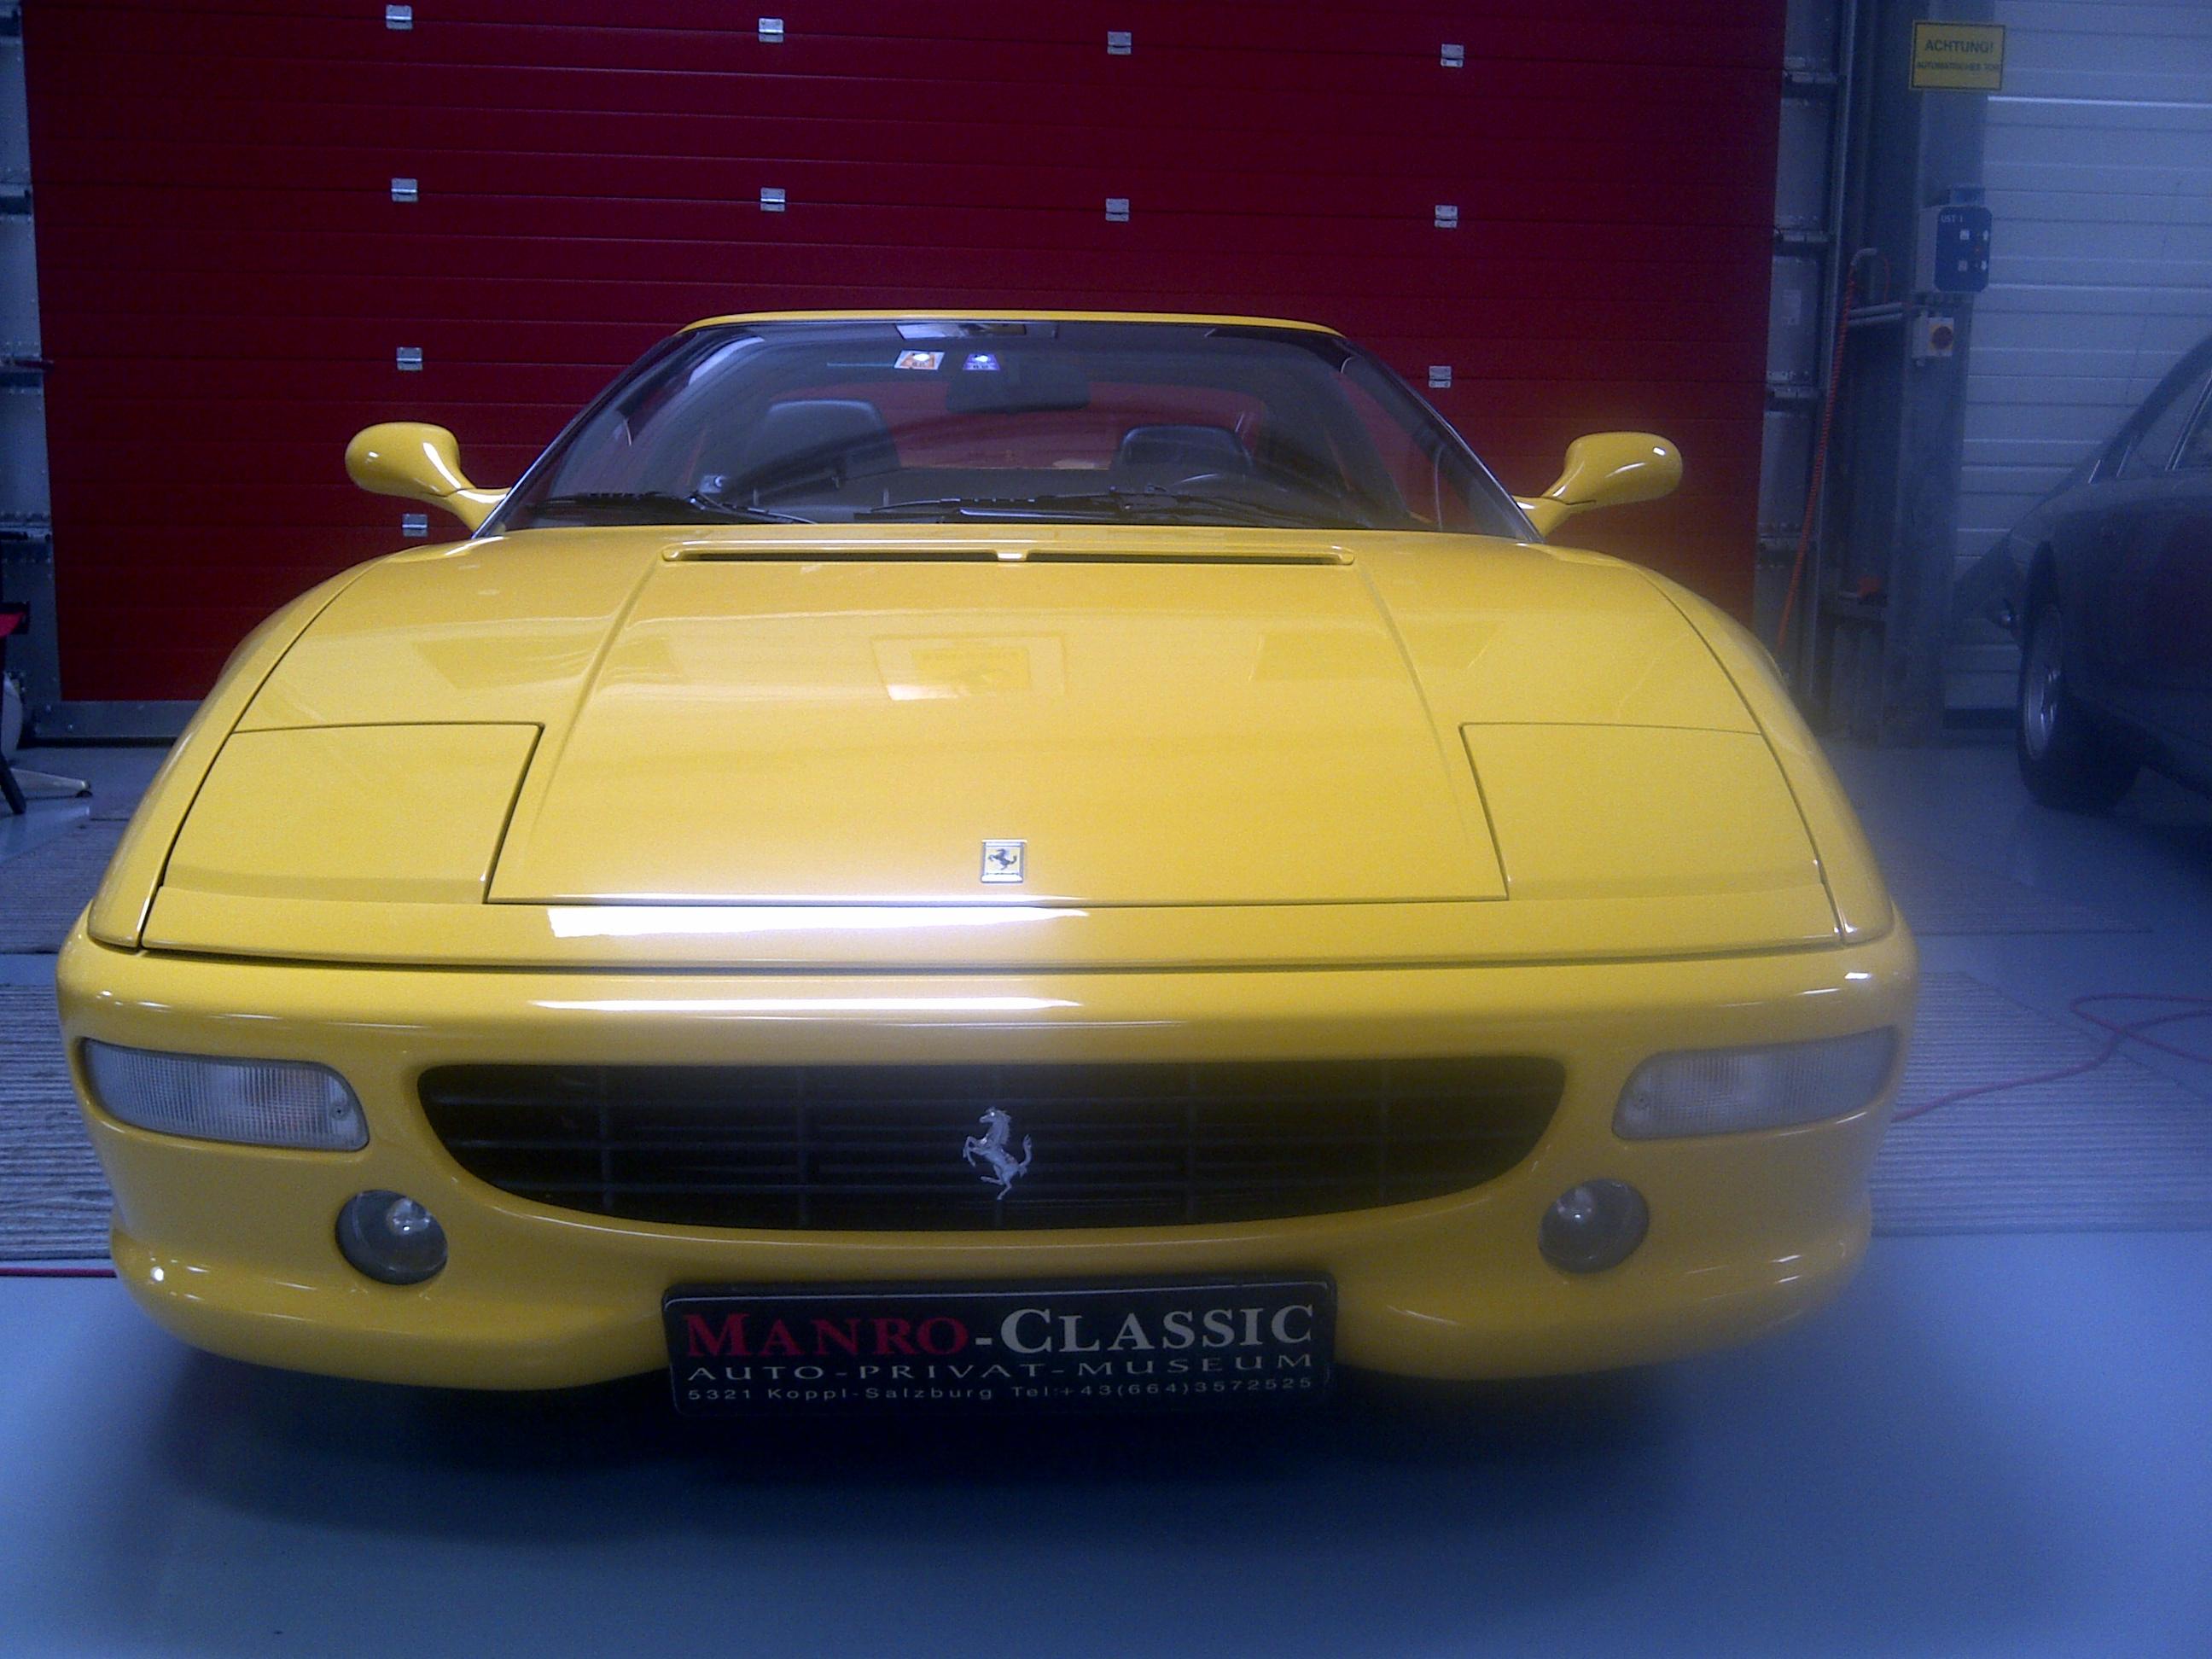 F%20355%20vorne Breathtaking Ferrari Mondial T Cabrio Kaufen Cars Trend